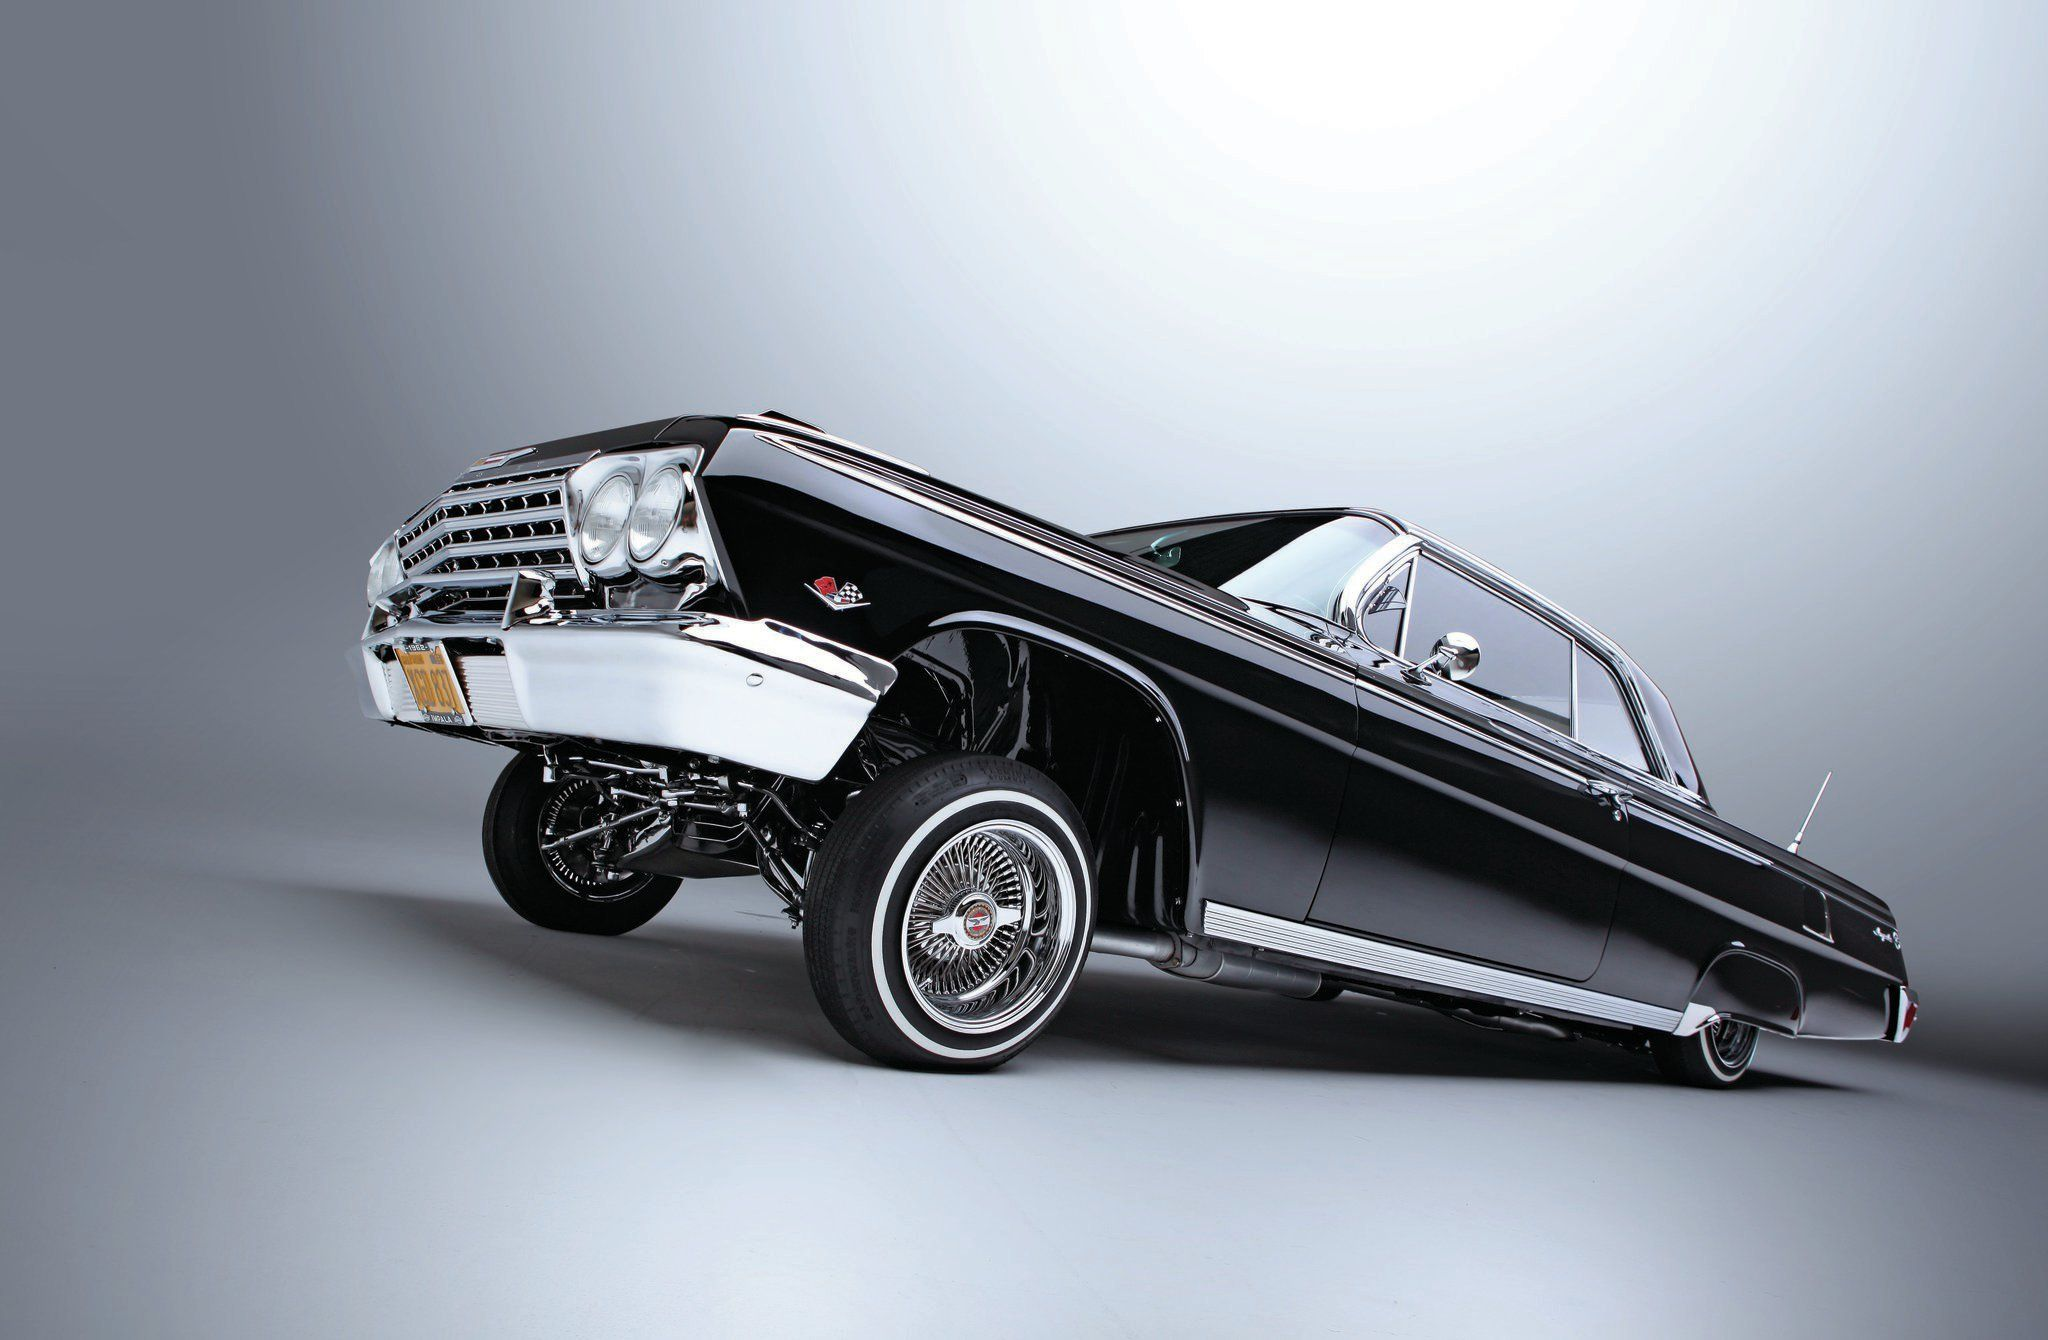 1962 Chevrolet Impala Dakota Digital Gauges 07 Photo 10